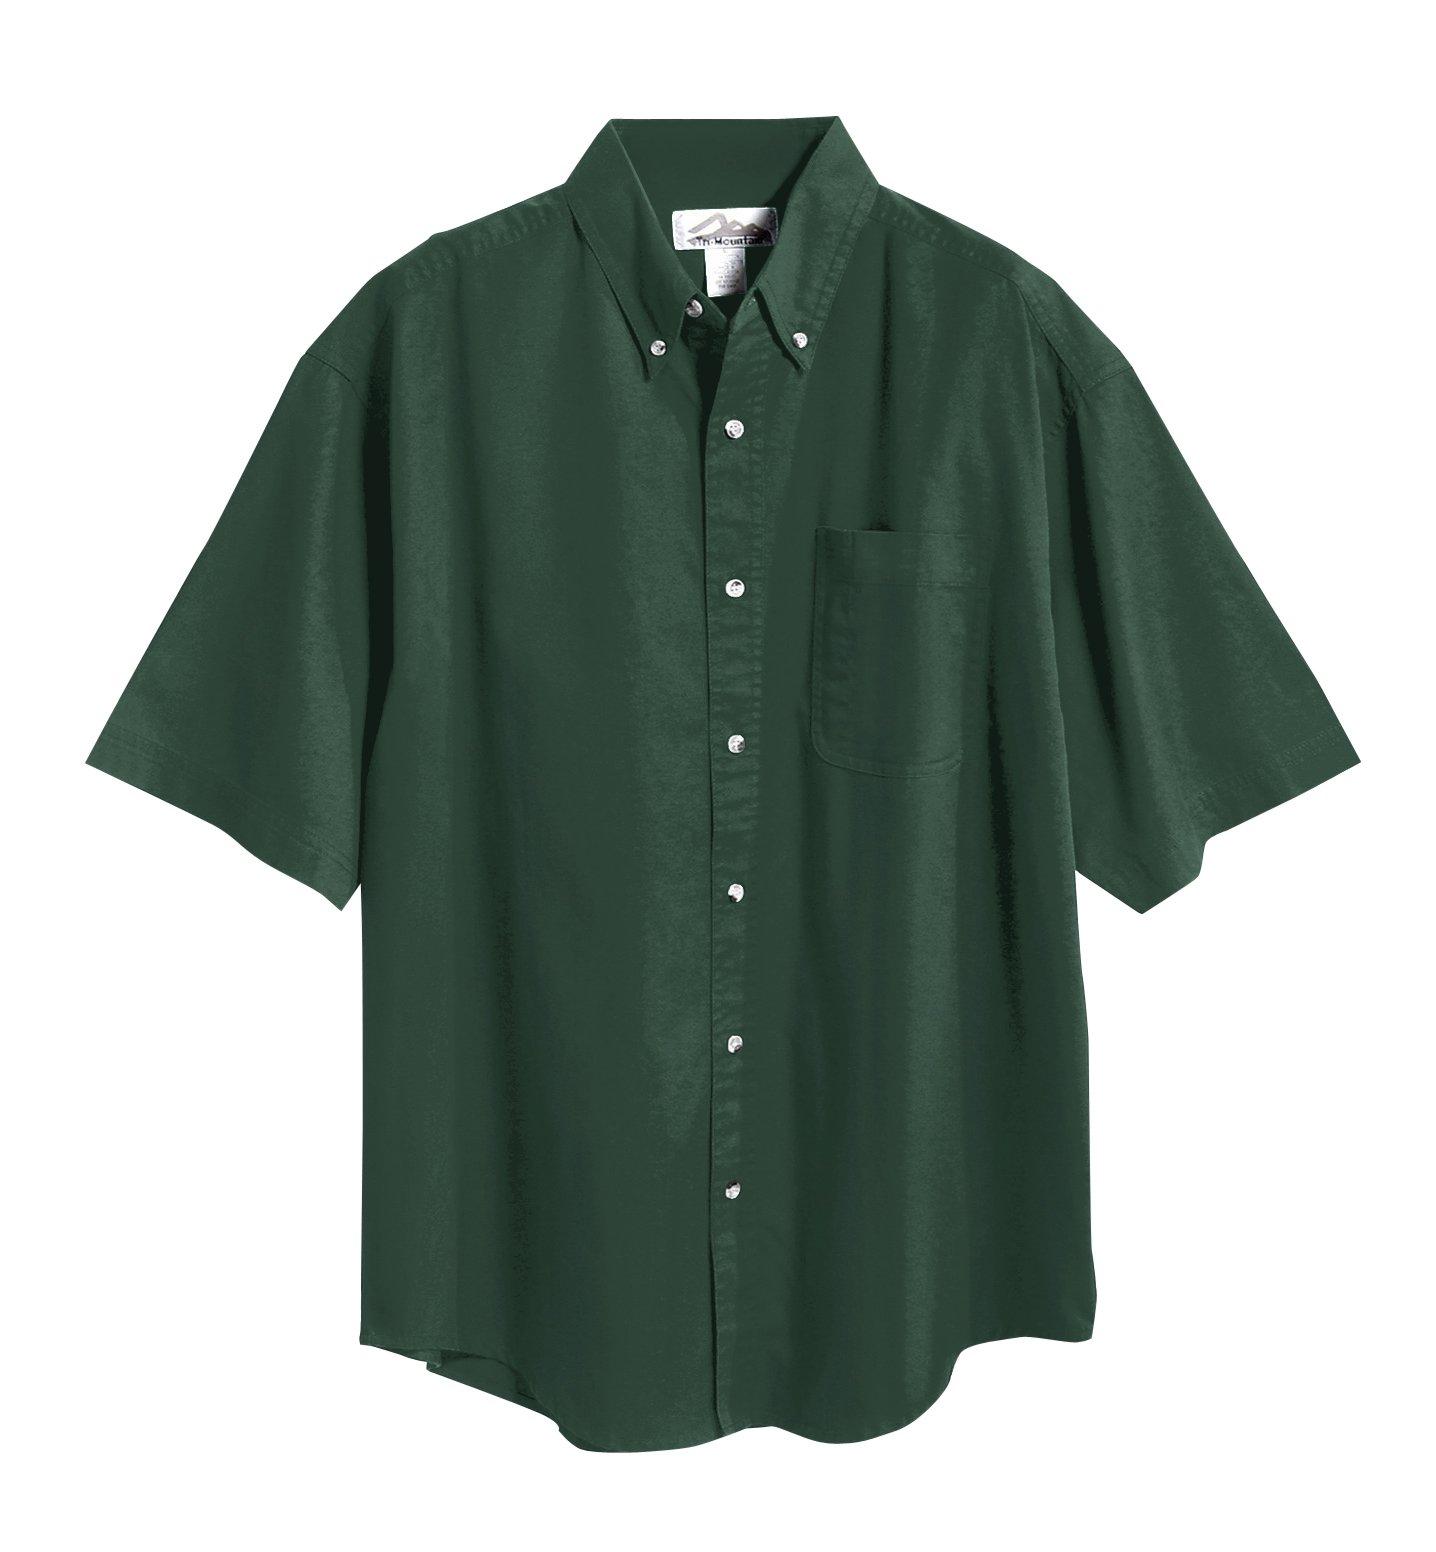 Tri-Mountain 768 Recruit Teflon Stain-Resistant Woven Shirt, Forest Green, 4XL